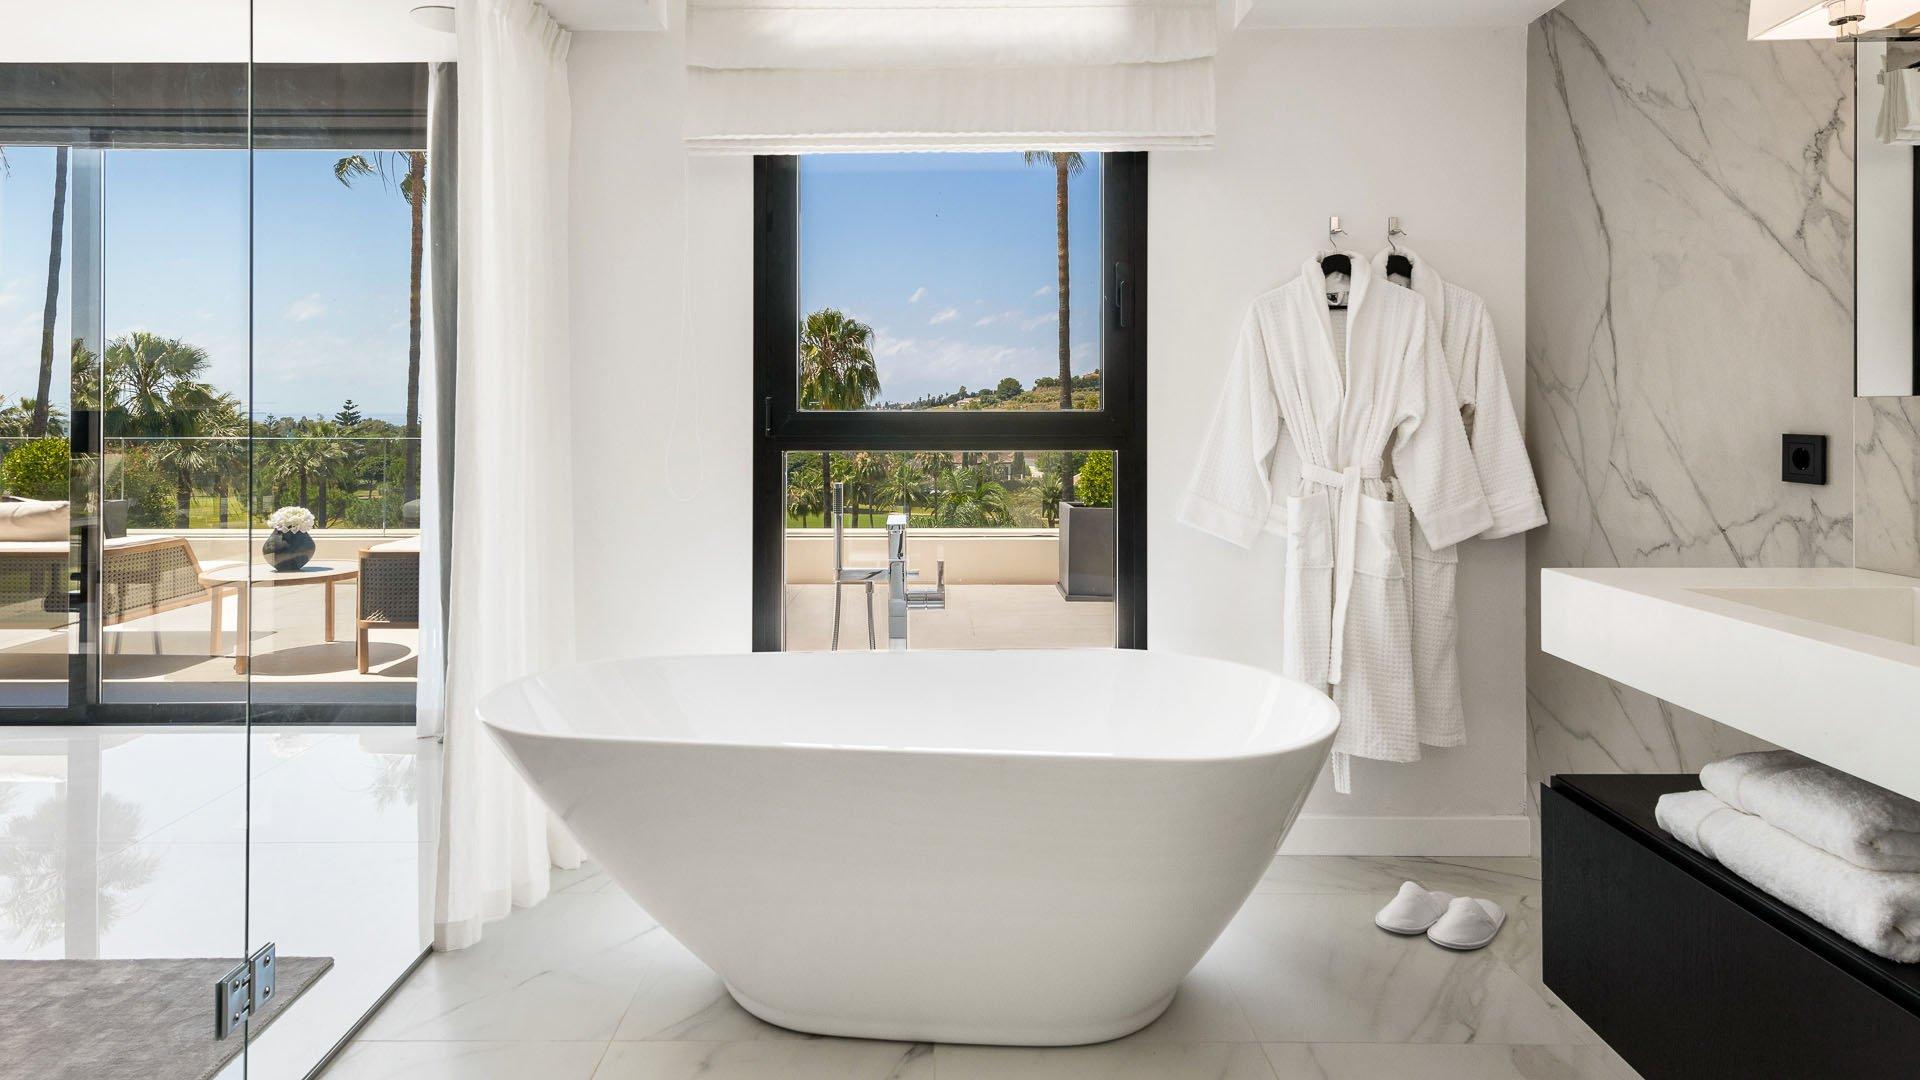 Villa Oak: Indrukwekkende front line golf villa in Nueva Andalucía, Marbella